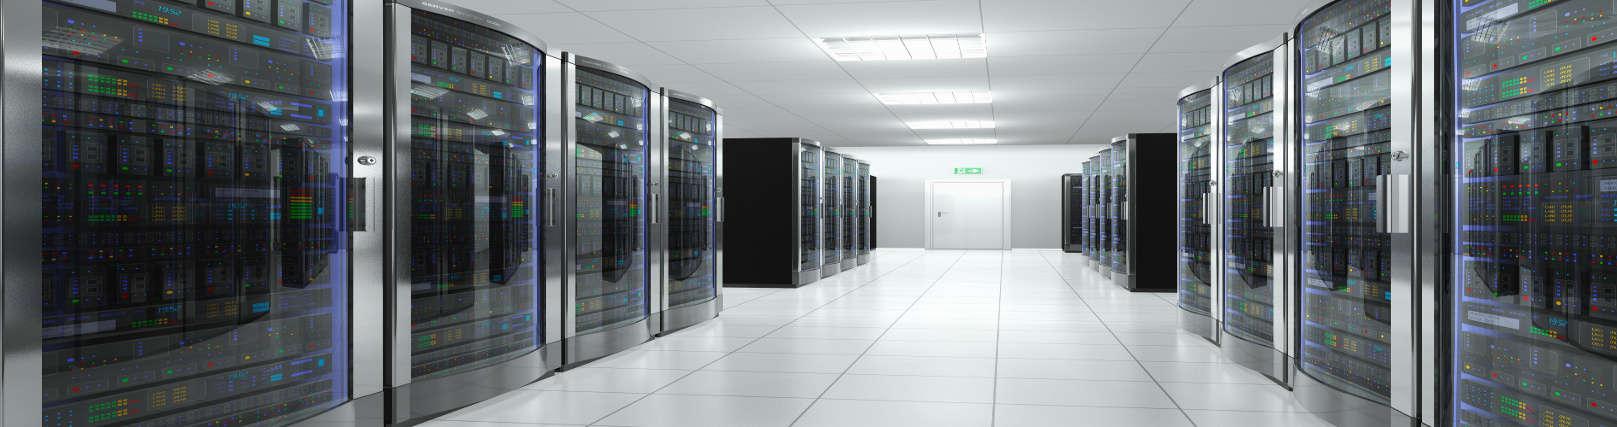 webhosting-server-hall